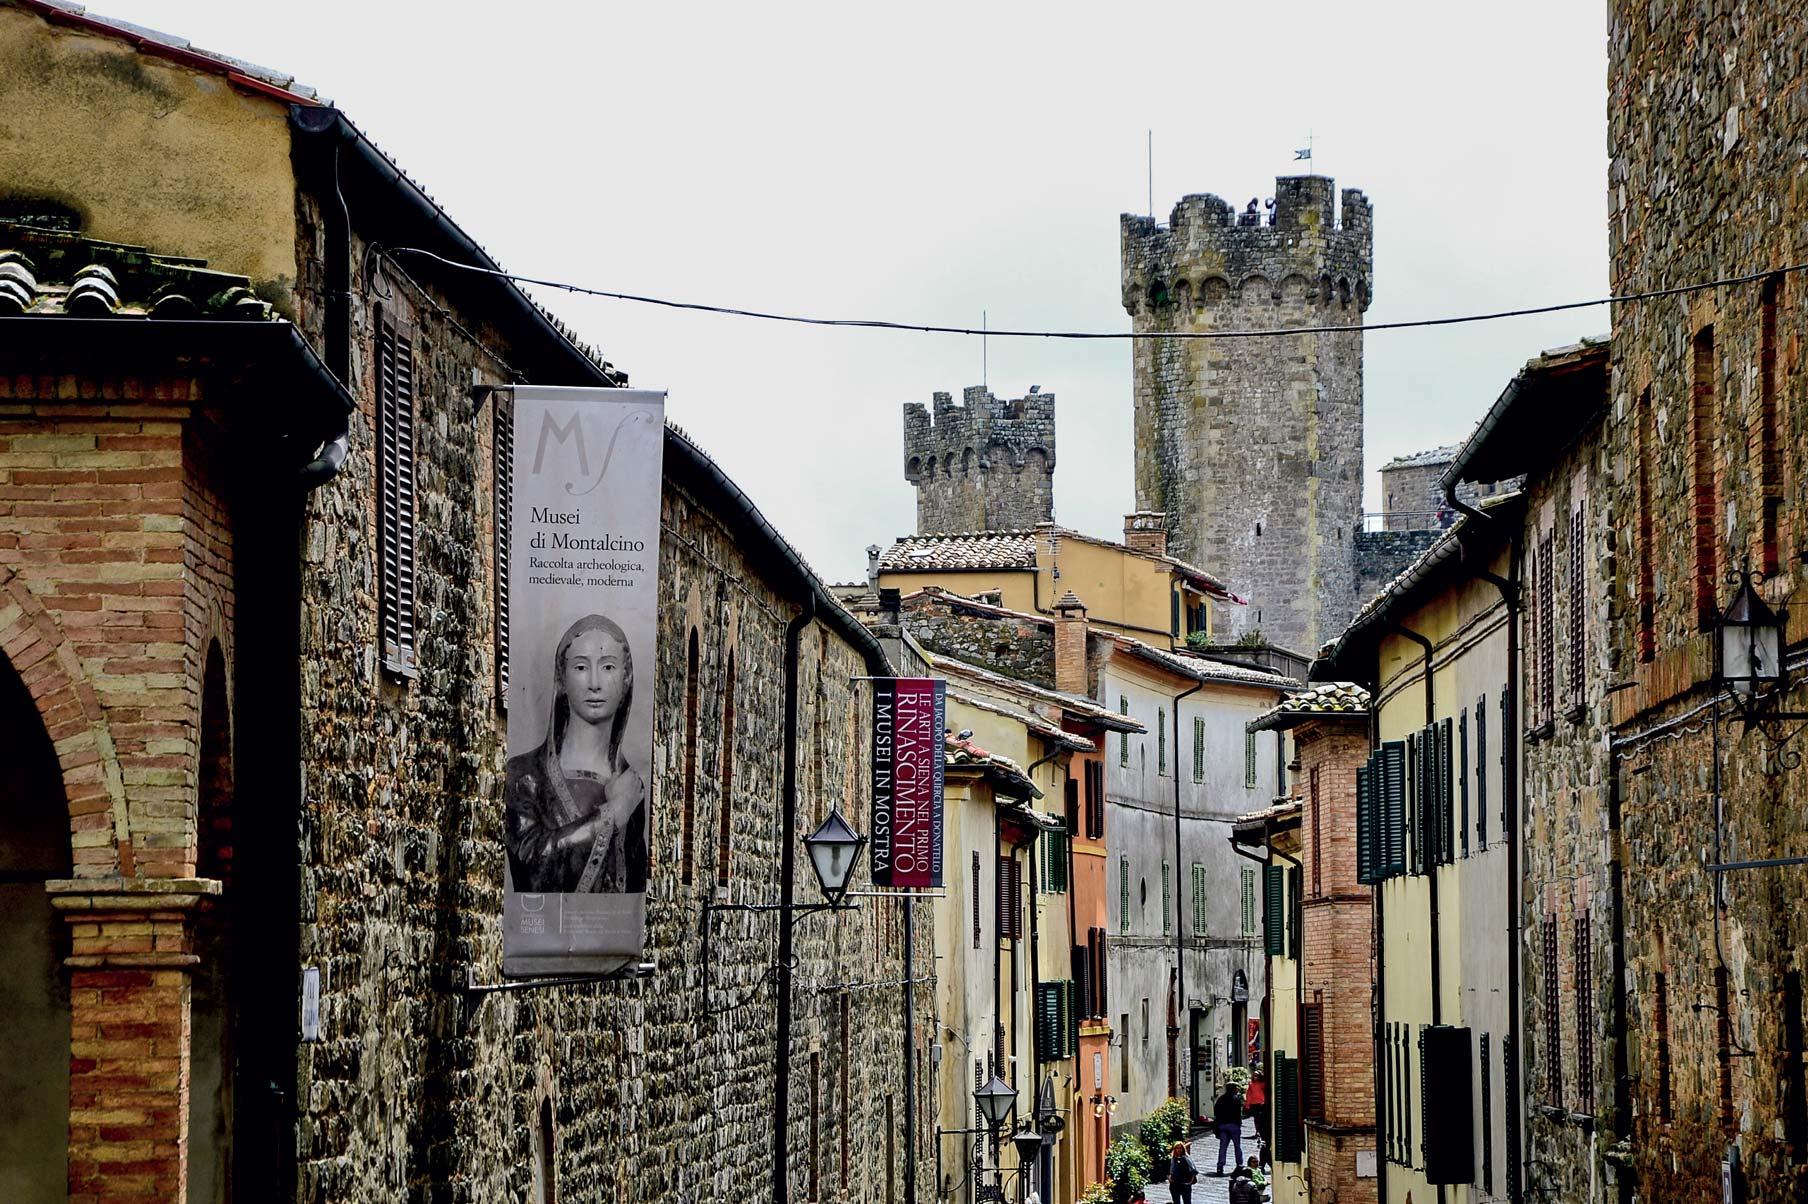 Montalcino borgo centro storico